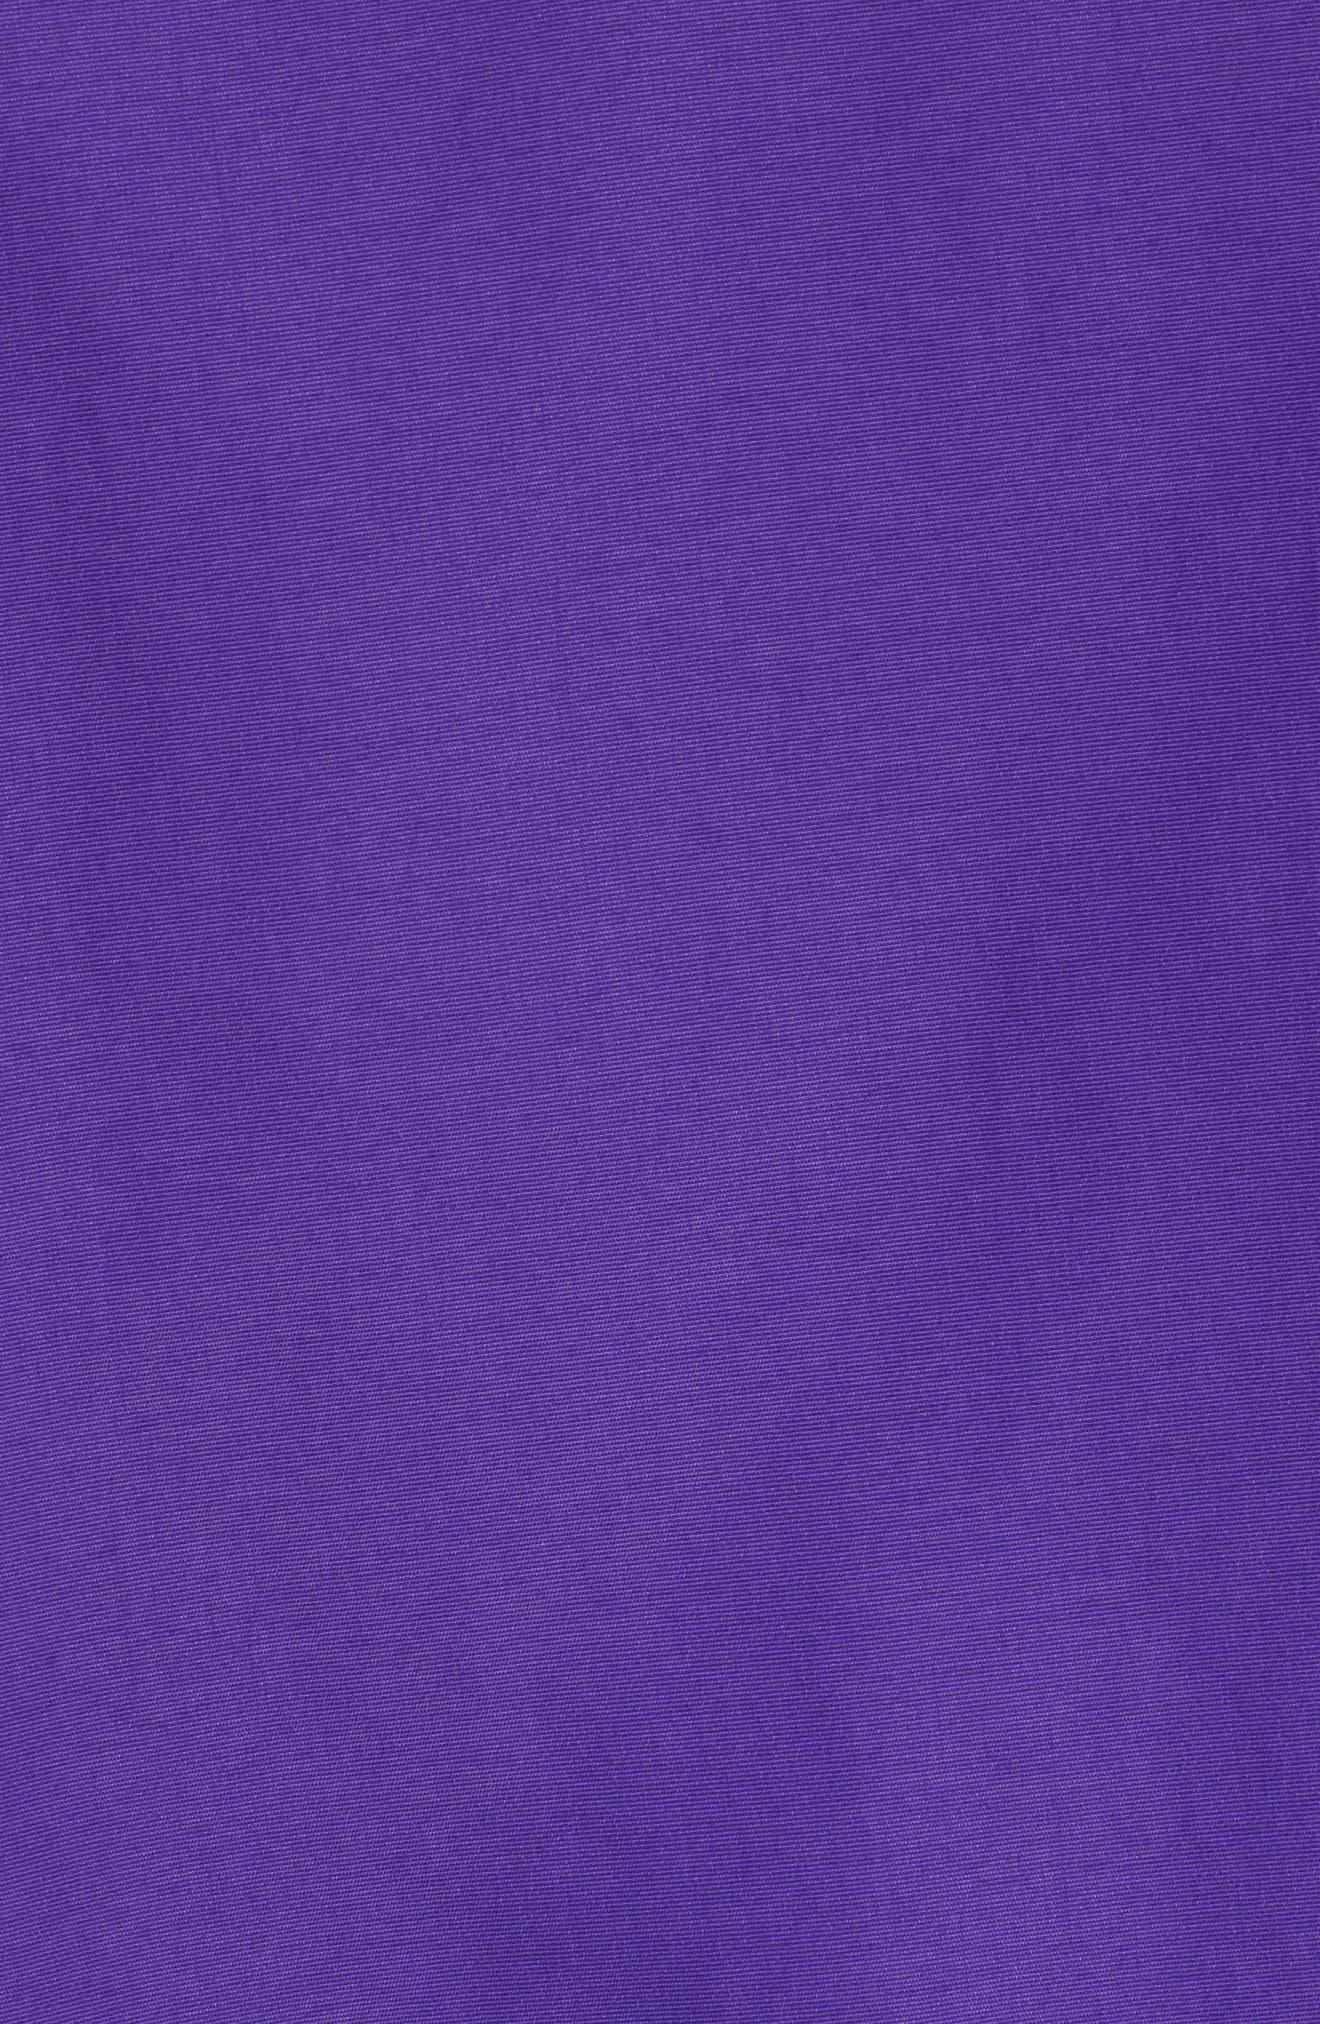 Los Angeles Lakers Courtside Warm-Up Jacket,                             Alternate thumbnail 6, color,                             FIELD PURPLE/PURPLE/ AMARILLO